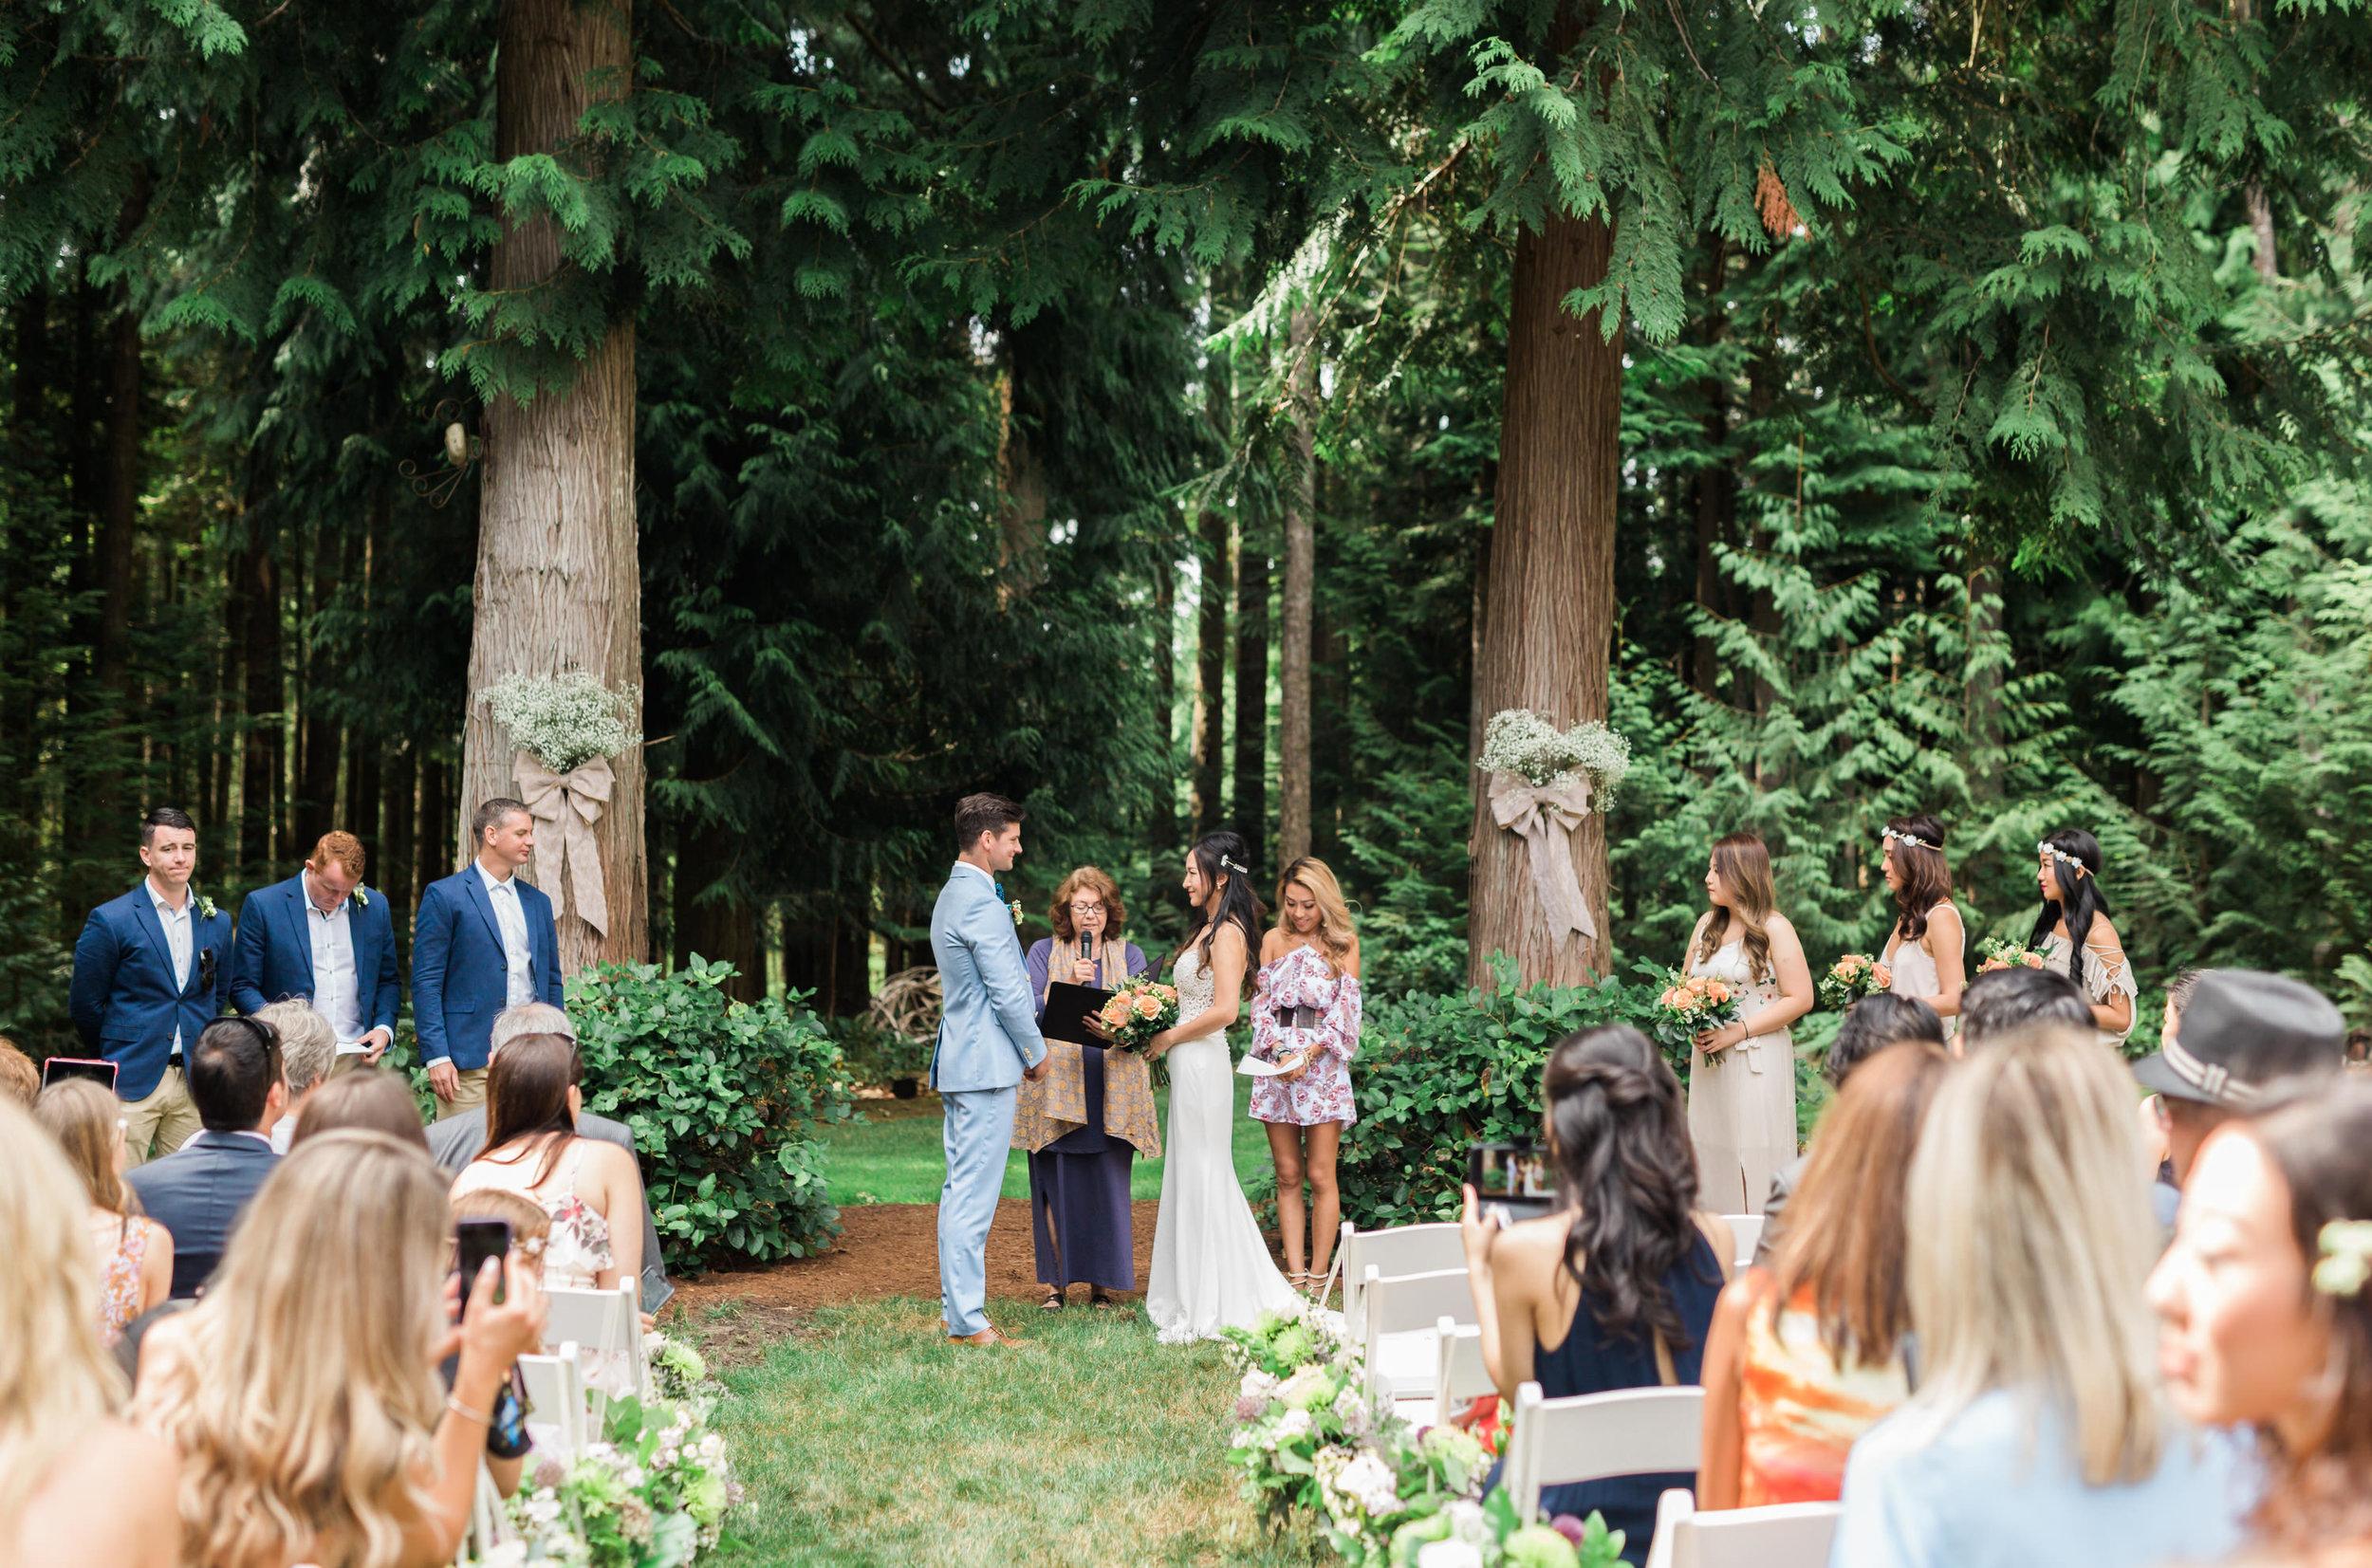 Linwood House Wedding Photos - Roberts Creek Wedding Photos - Vancouver Wedding Photographer & Videographer - Sunshine Coast Wedding Photos - Sunshine Coast Wedding Photographer - Jennifer Picard Photography - IMG_6317.jpg